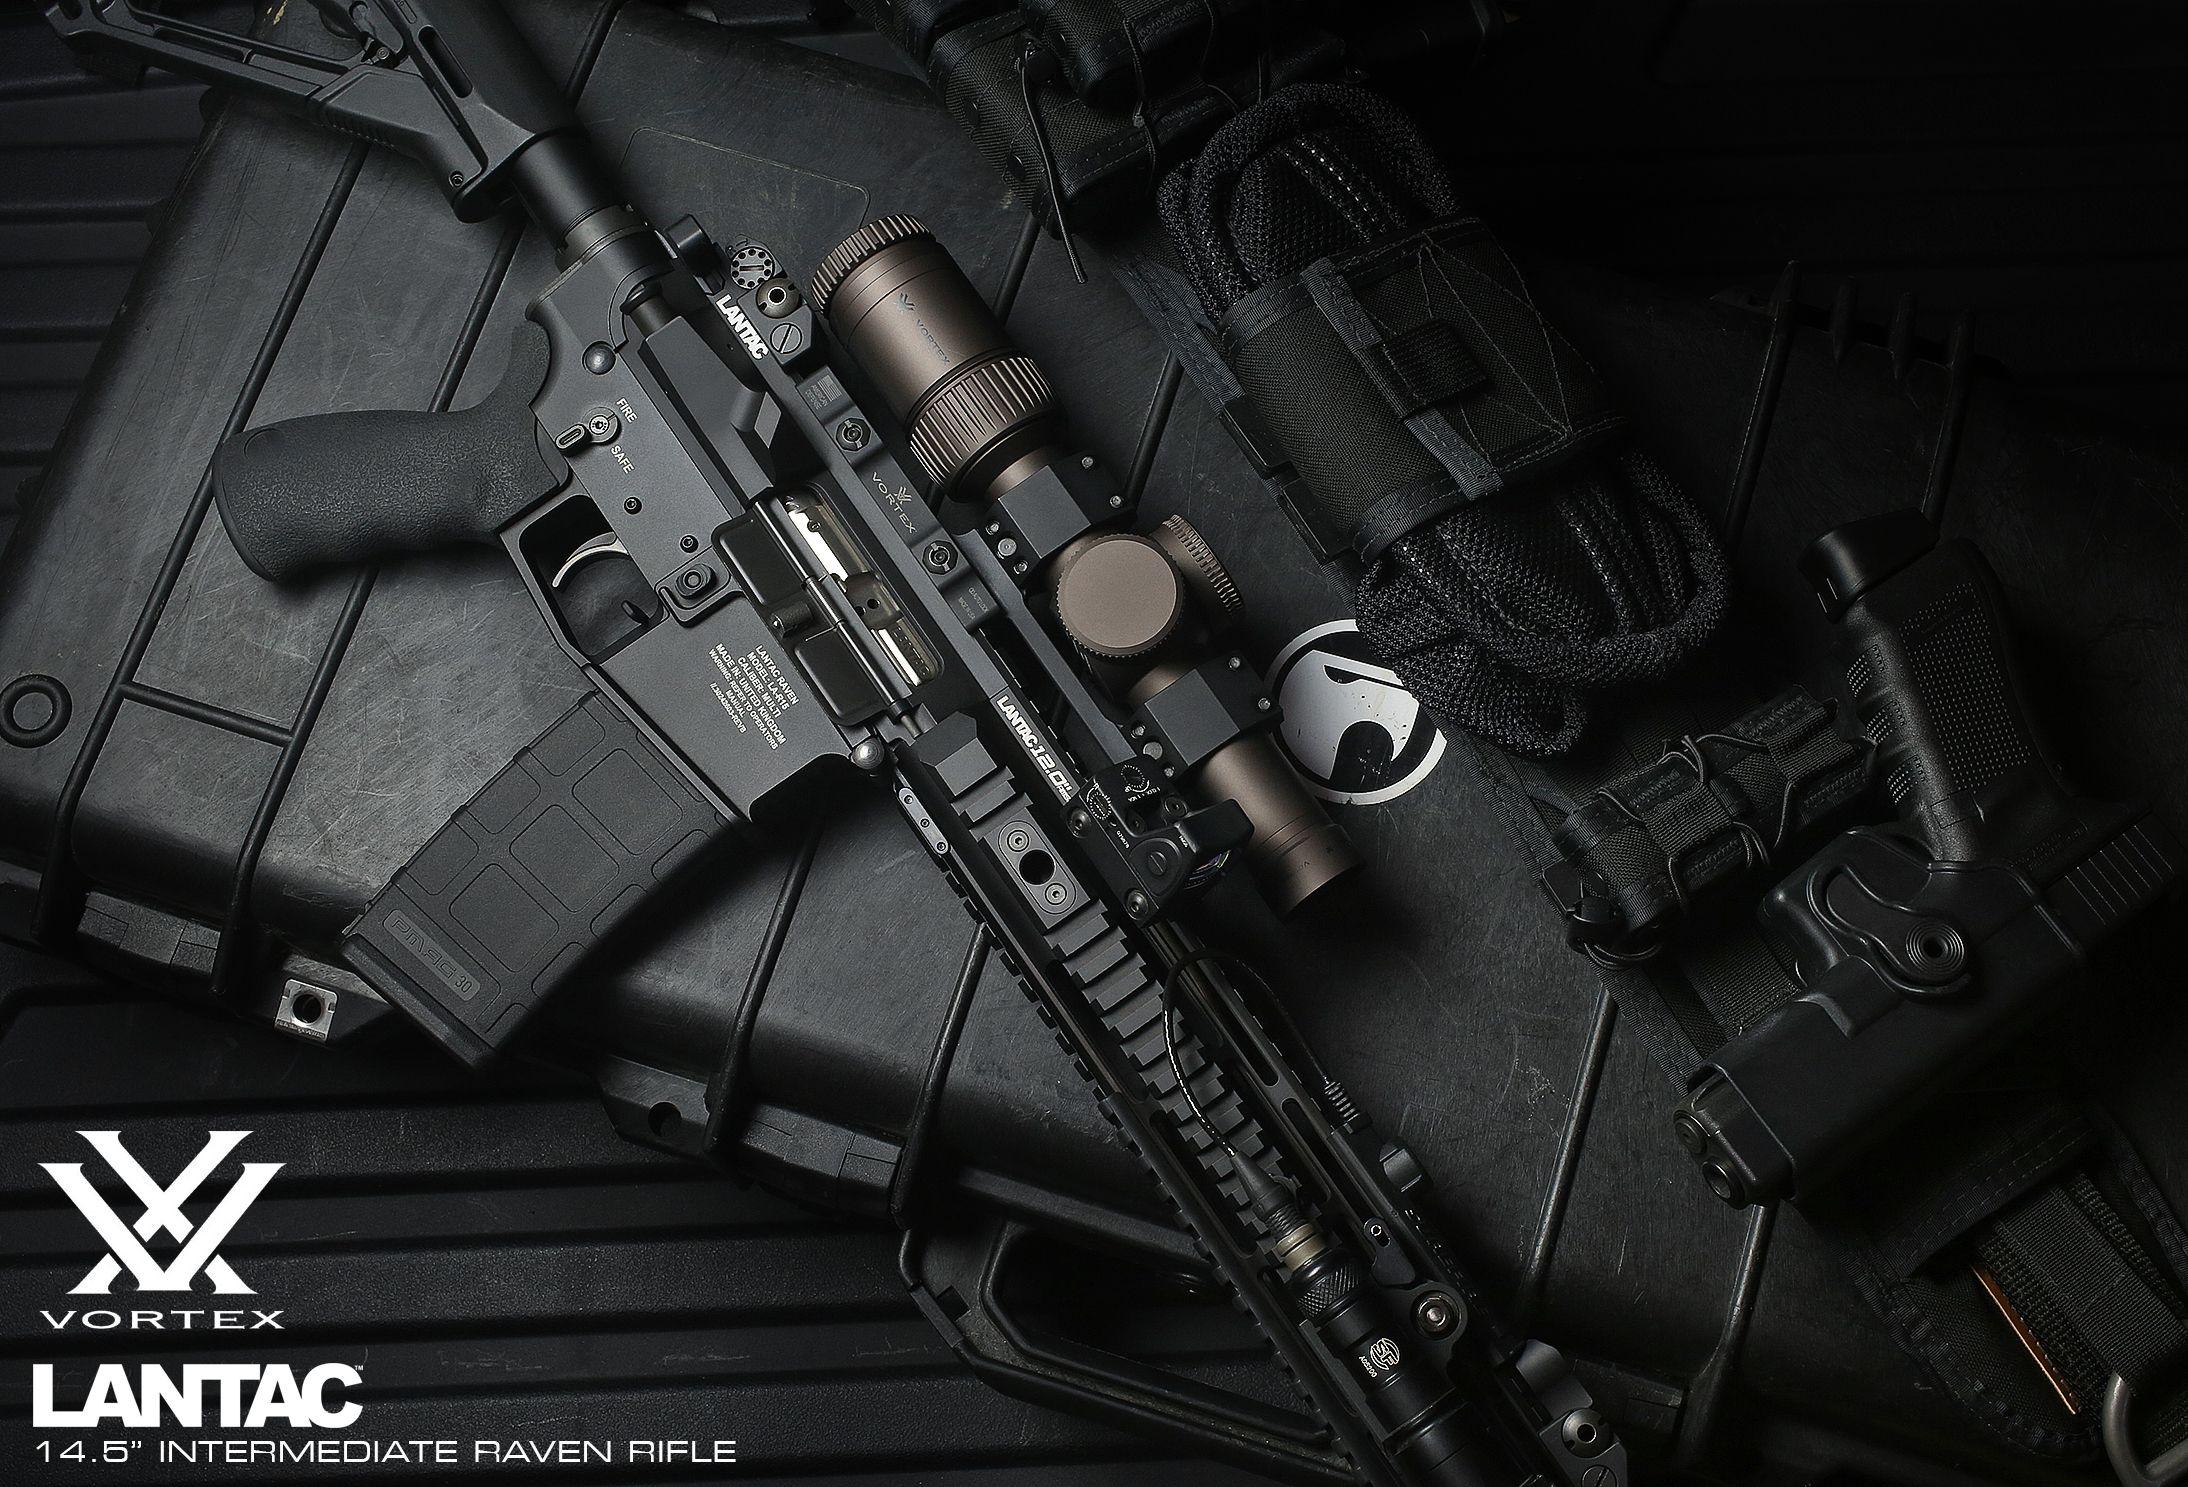 LANTAC Raven™ with Vortex Optics 1-6X Razor.